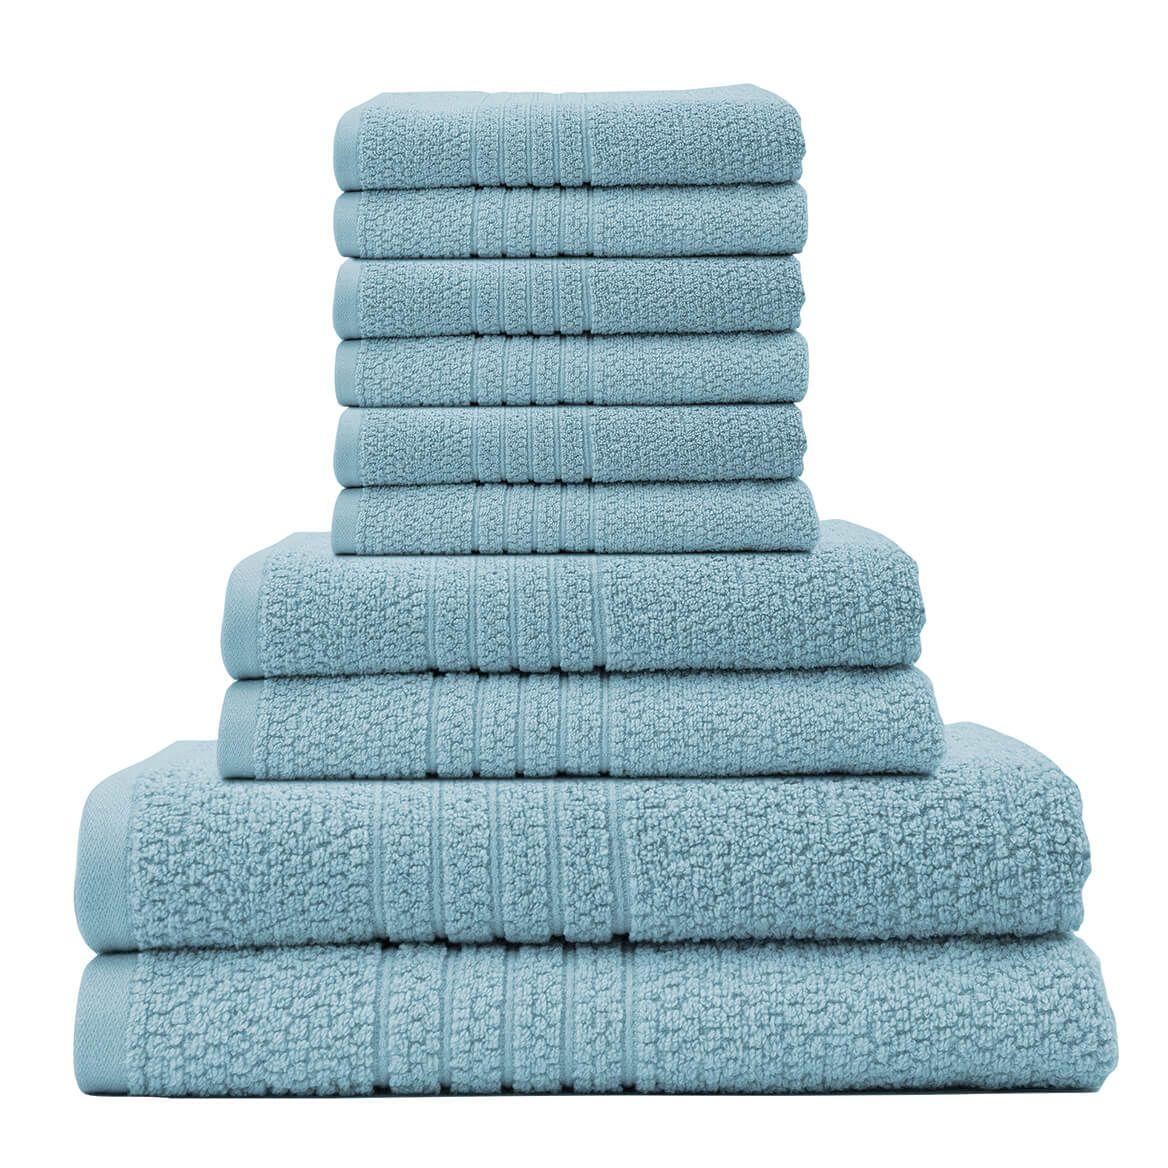 OakRidge™ 10-Piece Towel Set-366051